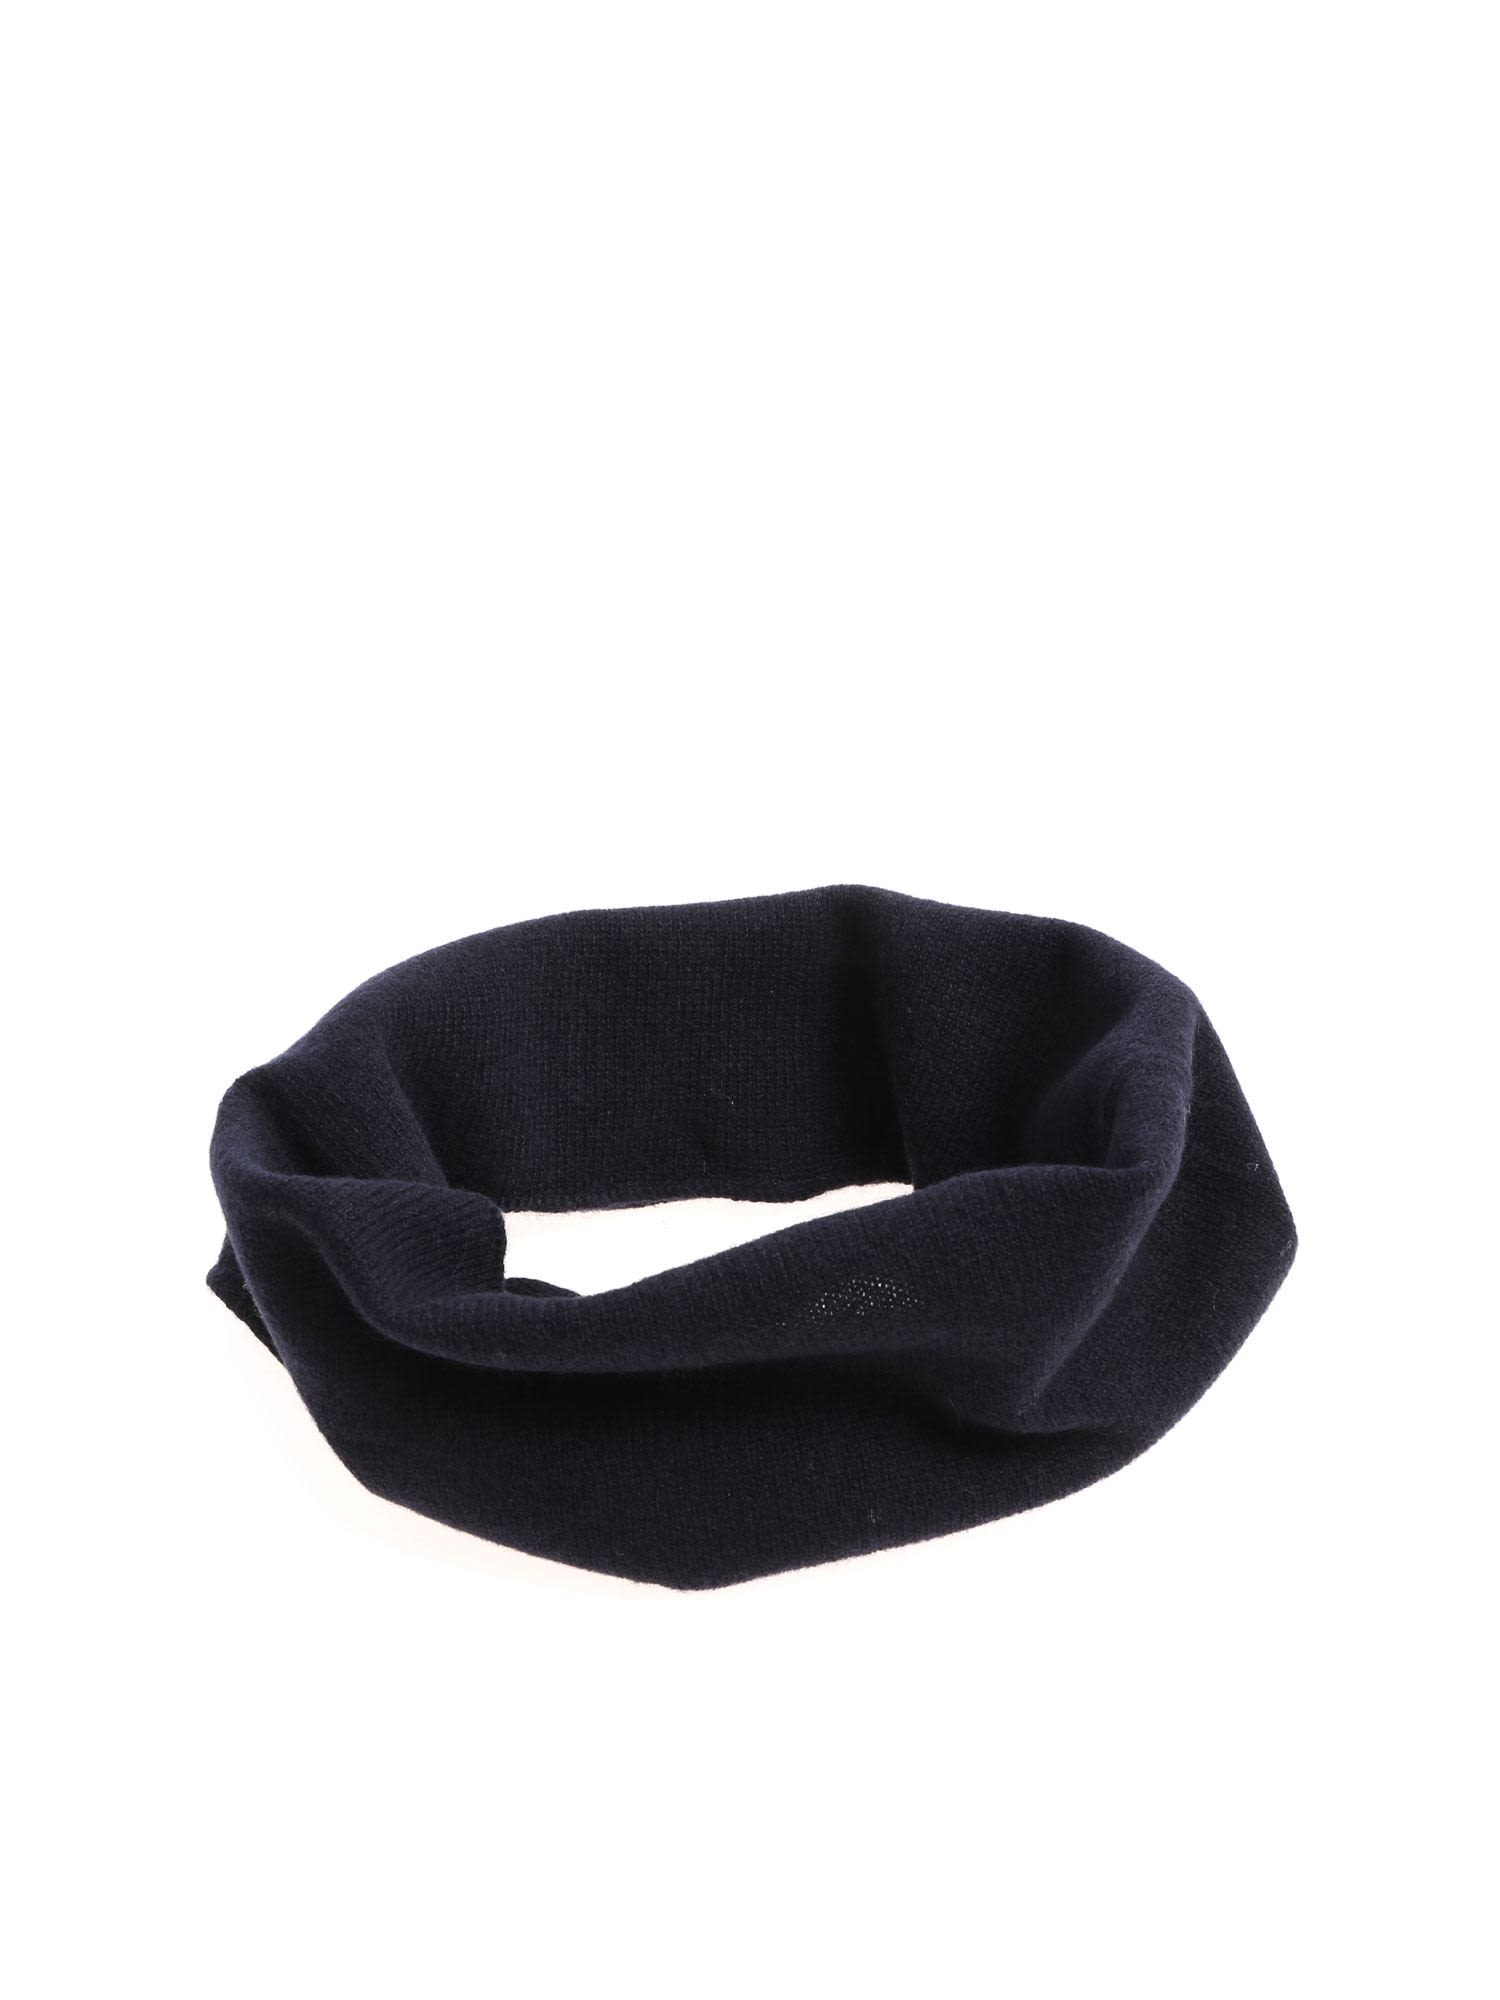 Lamberto Losani Ribbed Collar